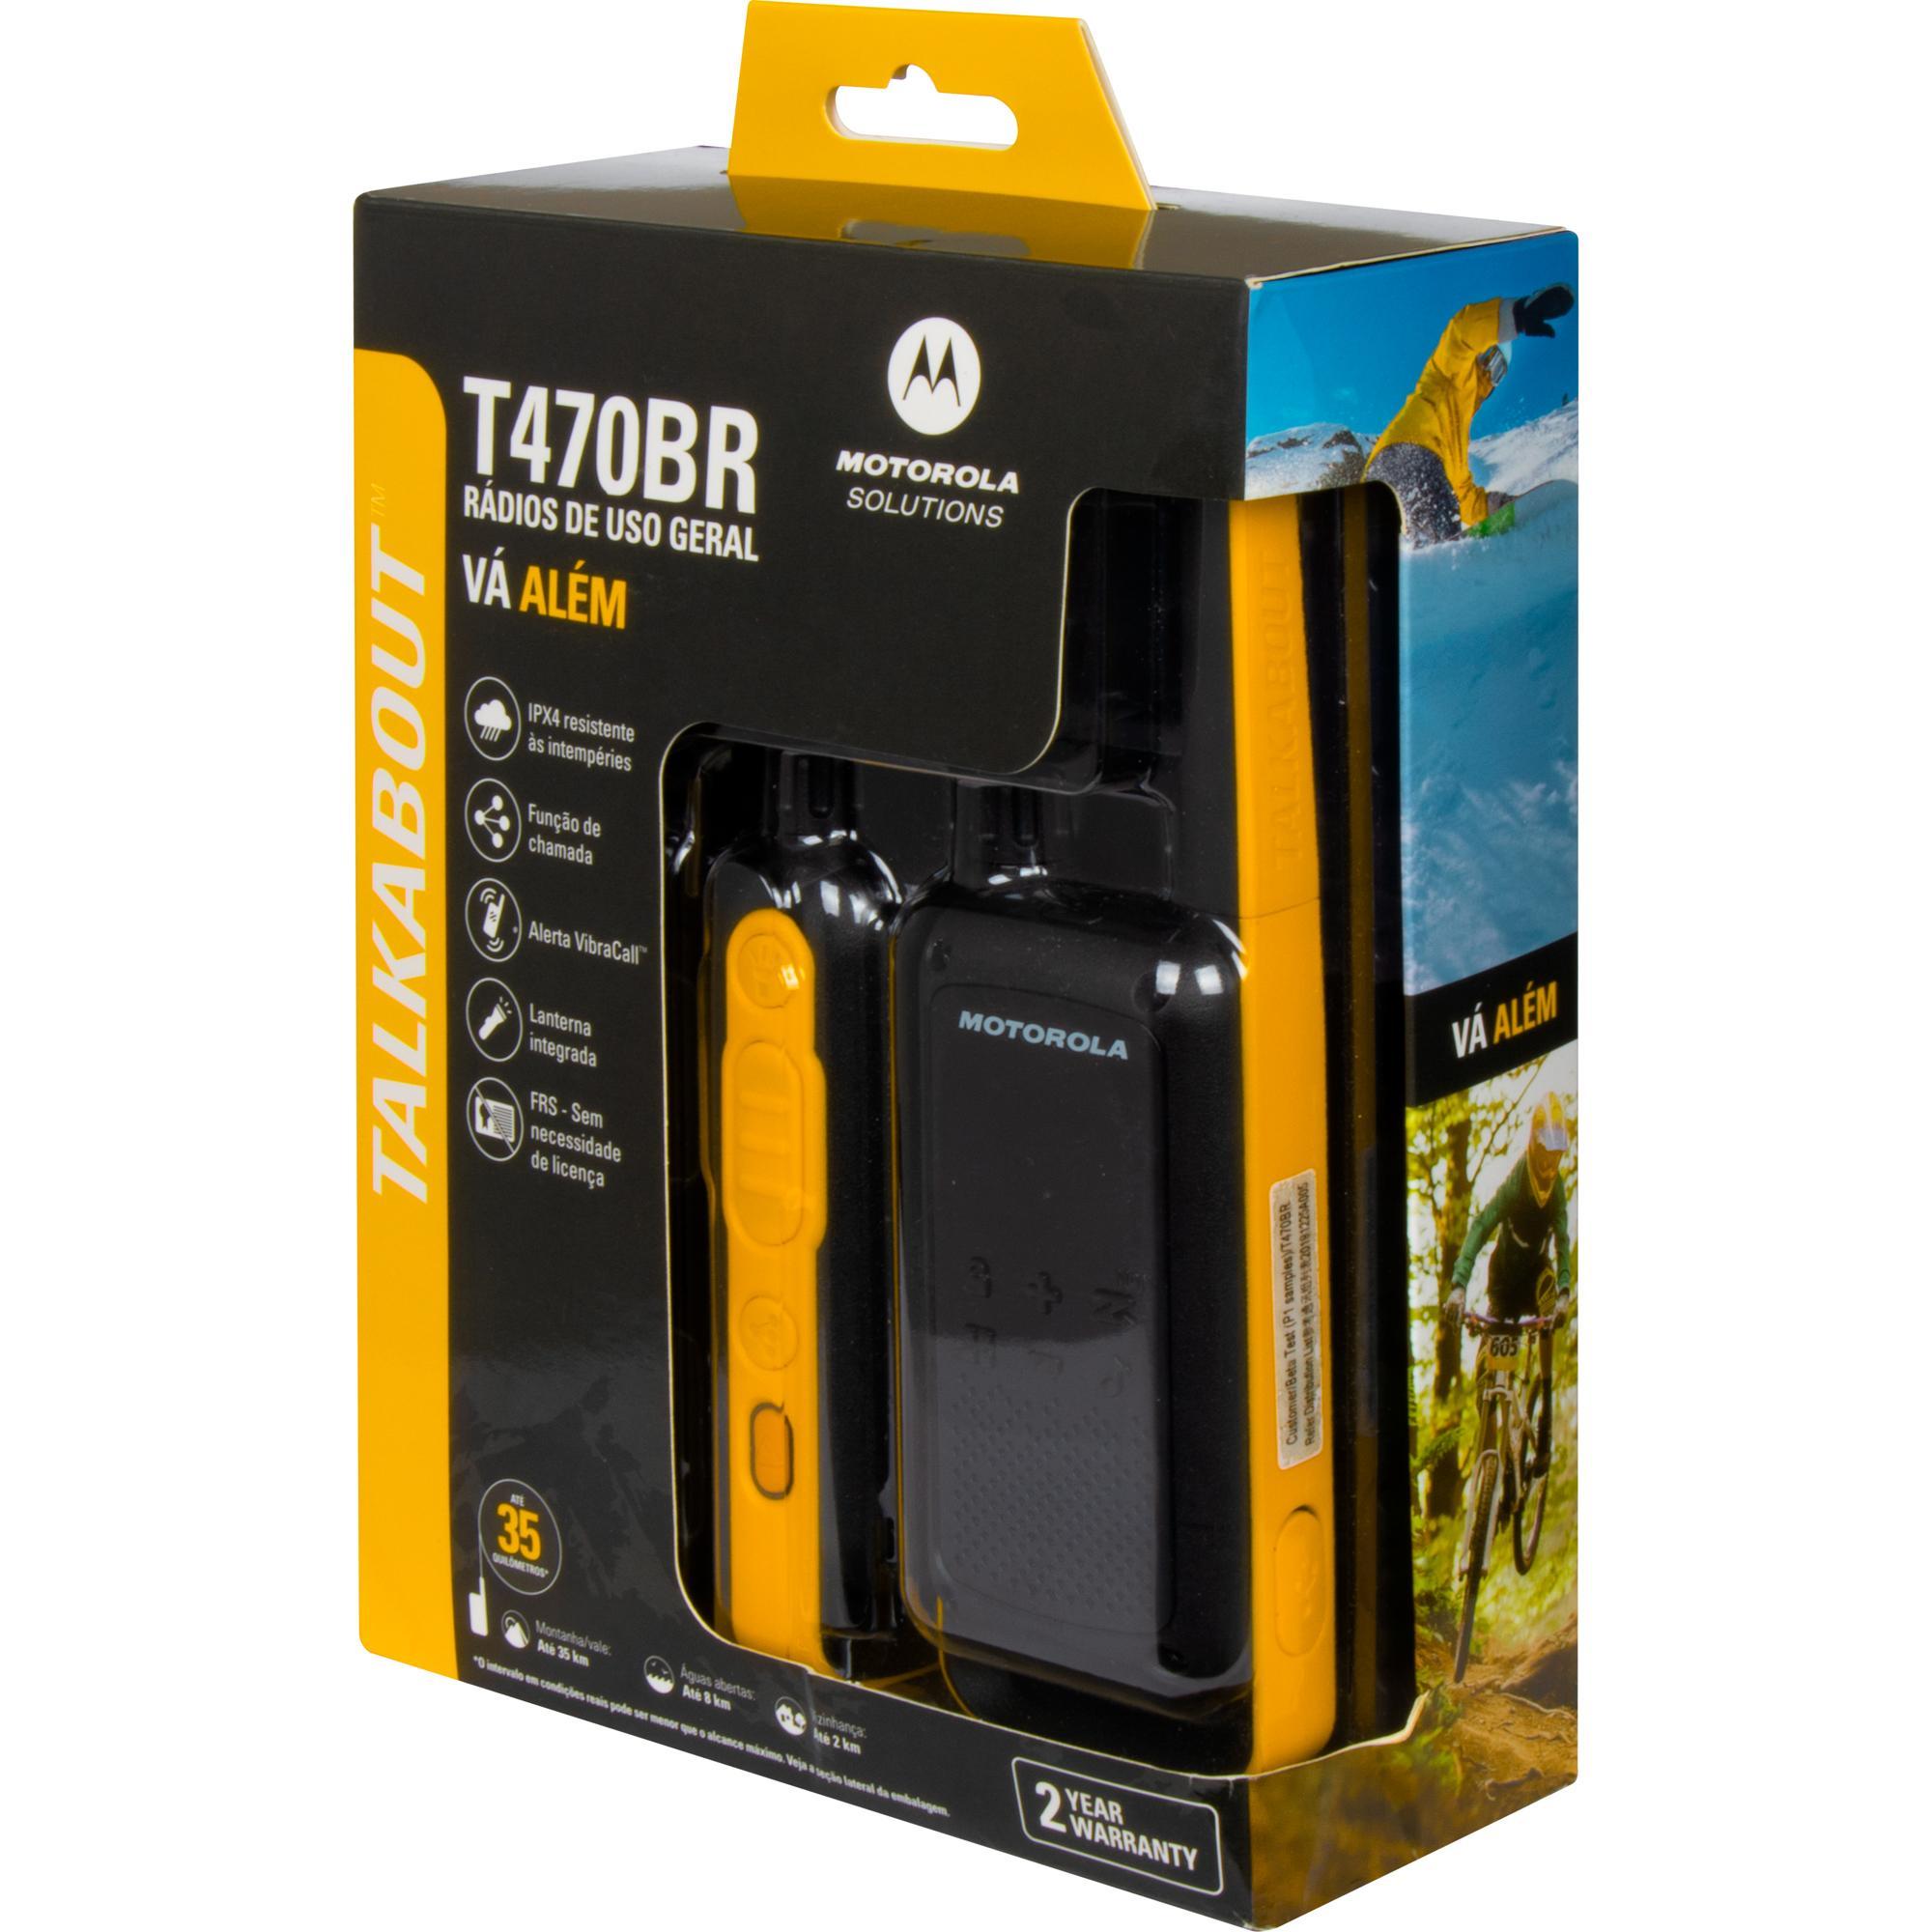 Rádio Comunicador Talkabout 35km T470BR Amarelo/Preto MOTORO